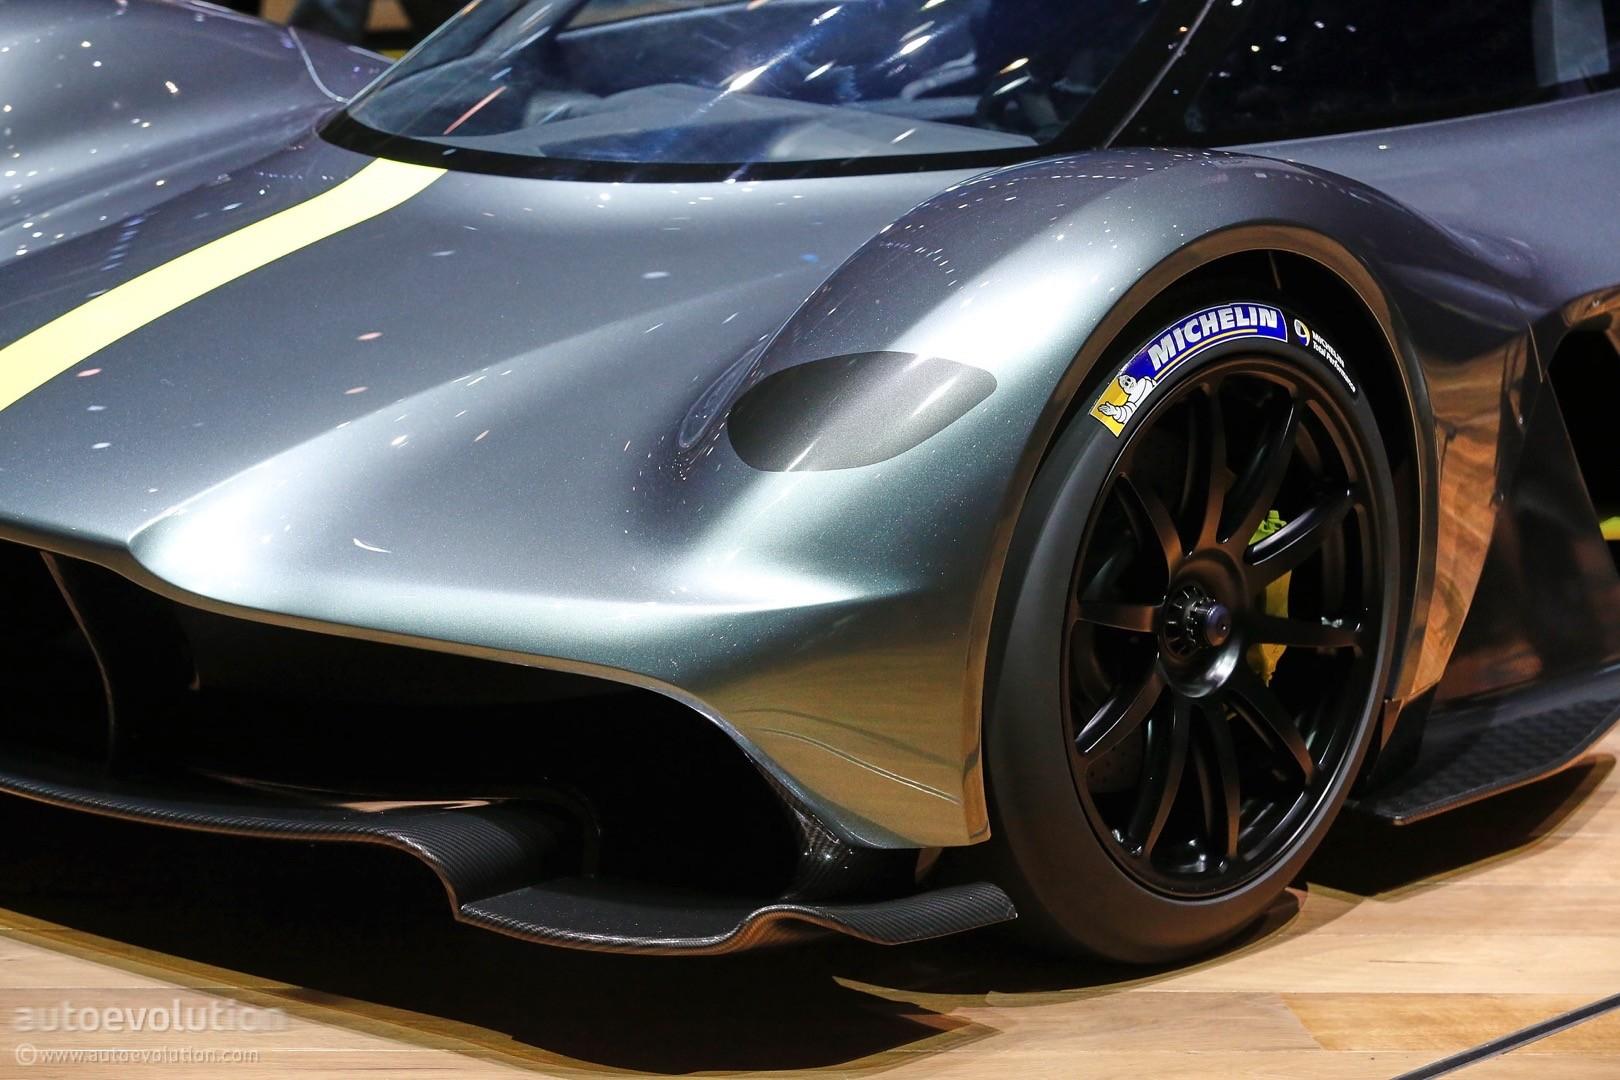 Aston Martin Valkyrie Shows Up In Geneva Wearing Michelin